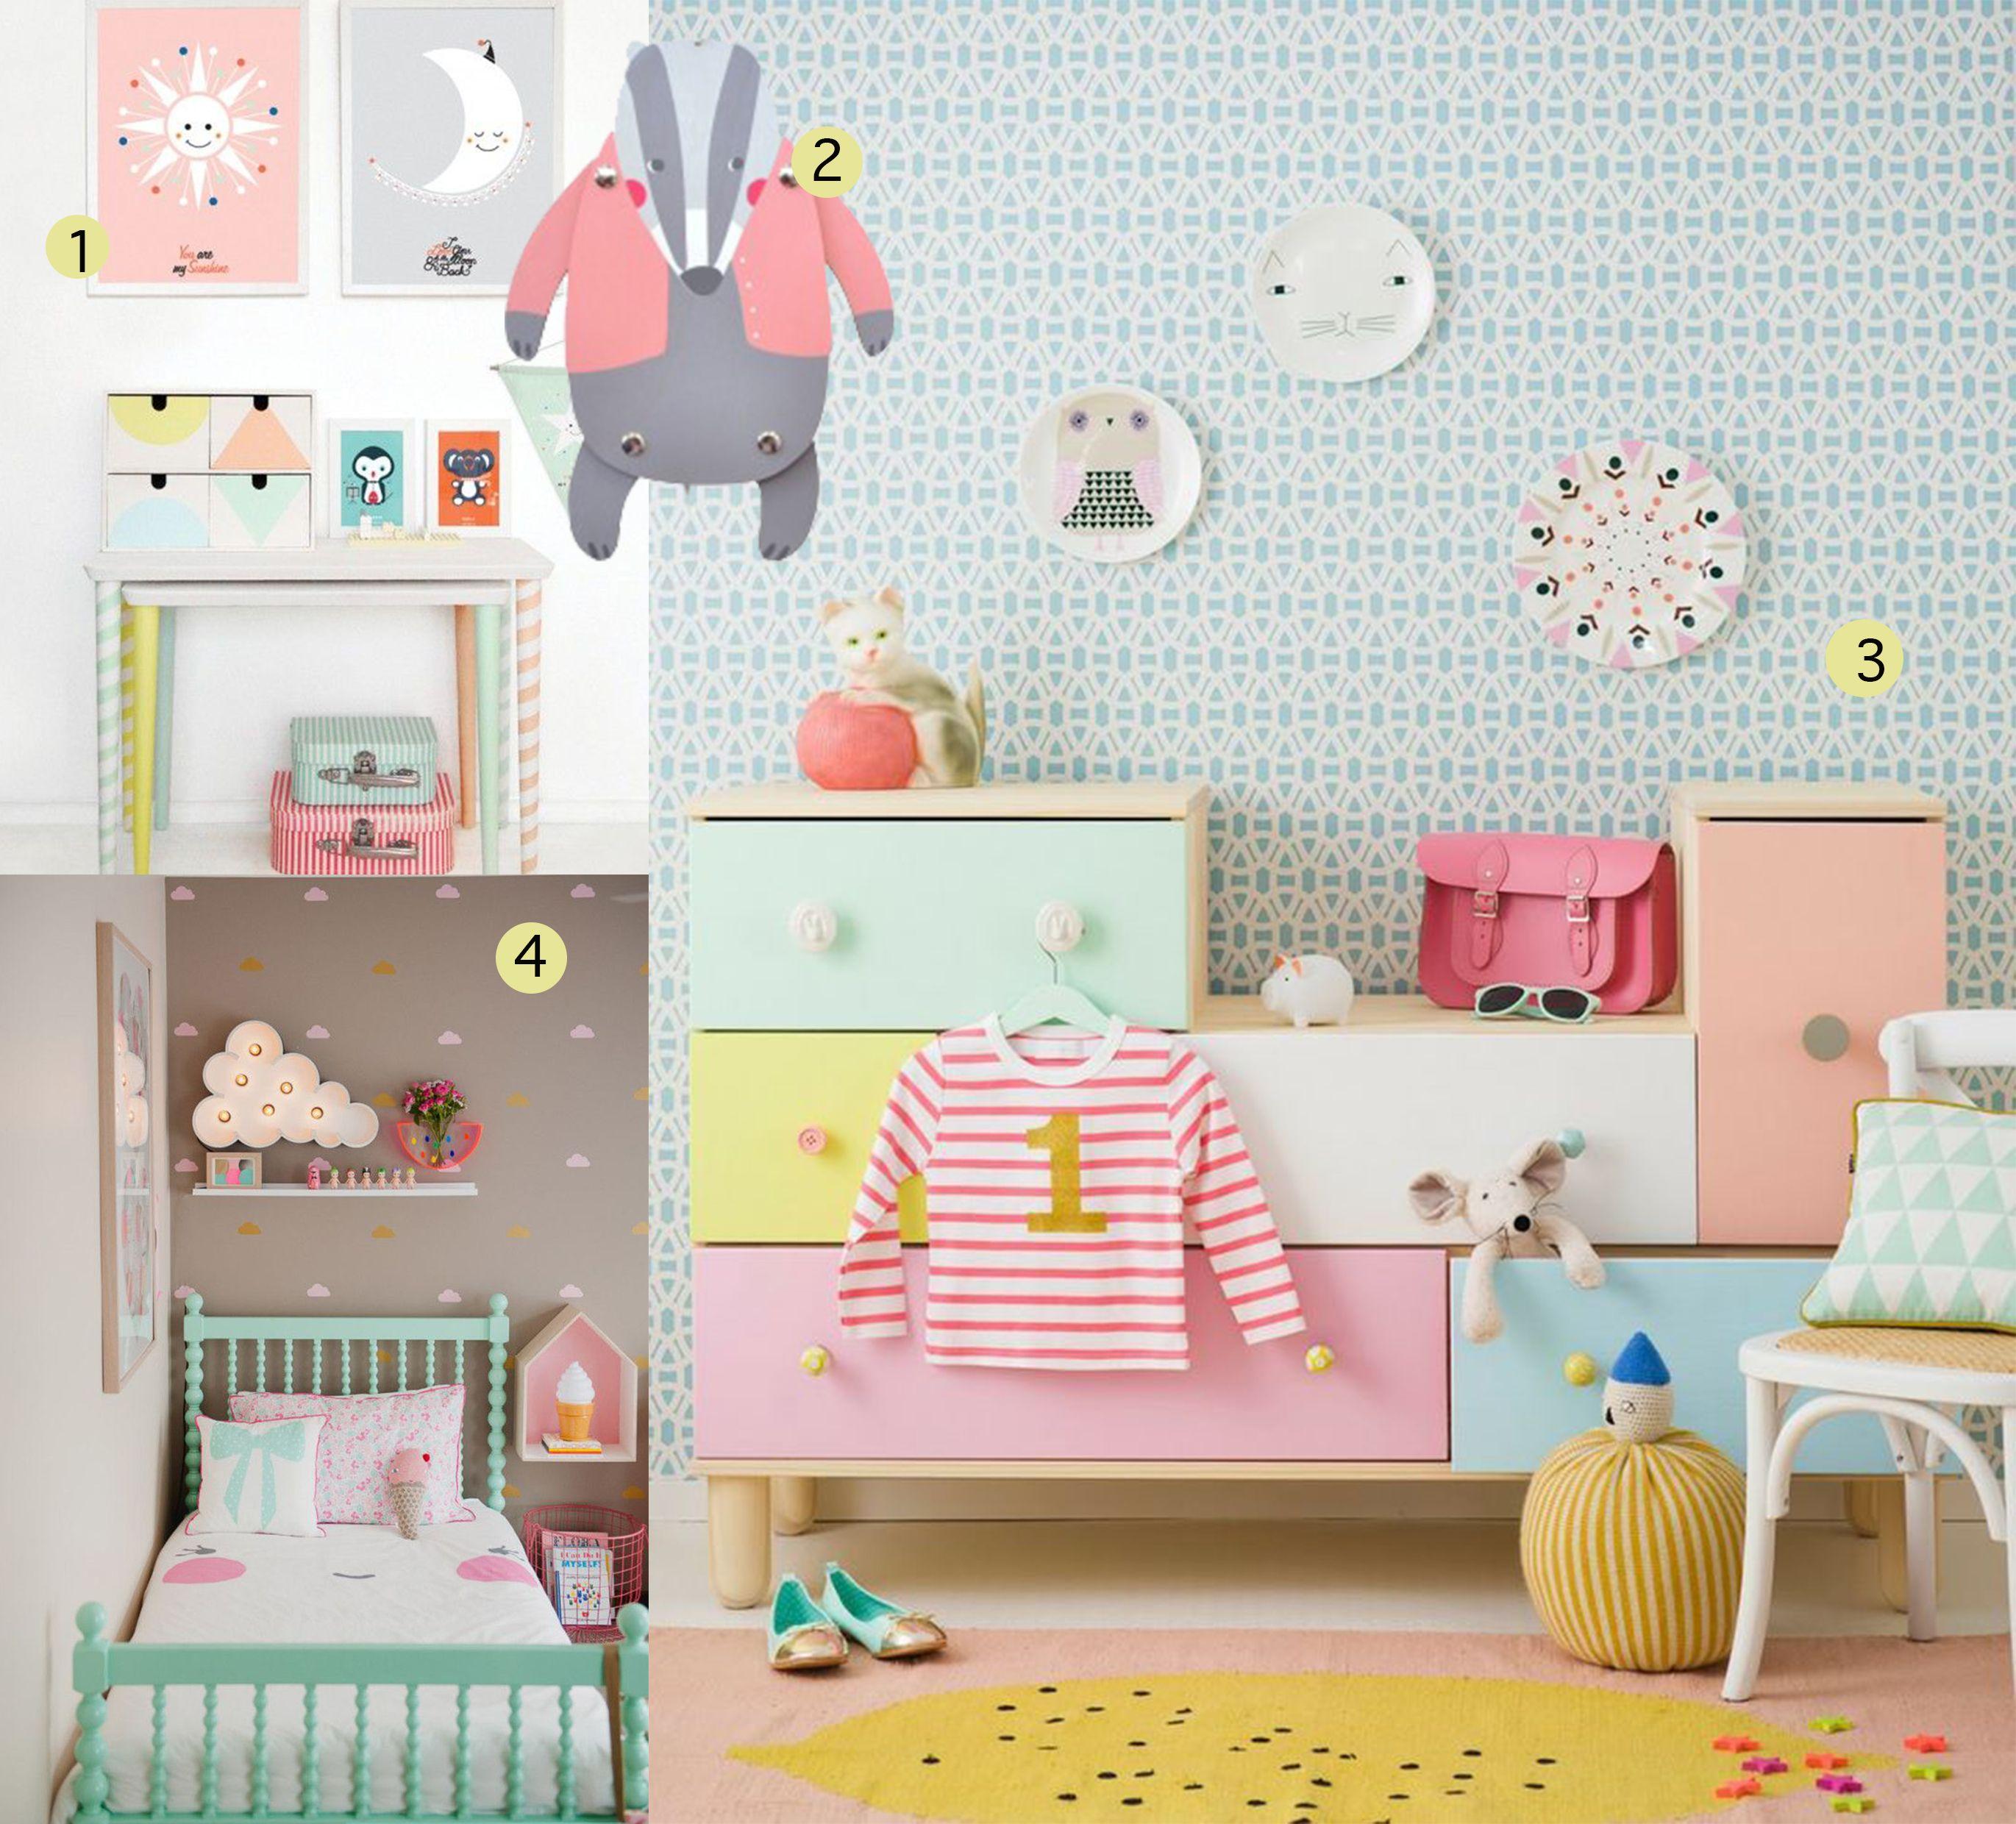 kinderkamer pastel - google zoeken | kinderkamer | pinterest, Deco ideeën